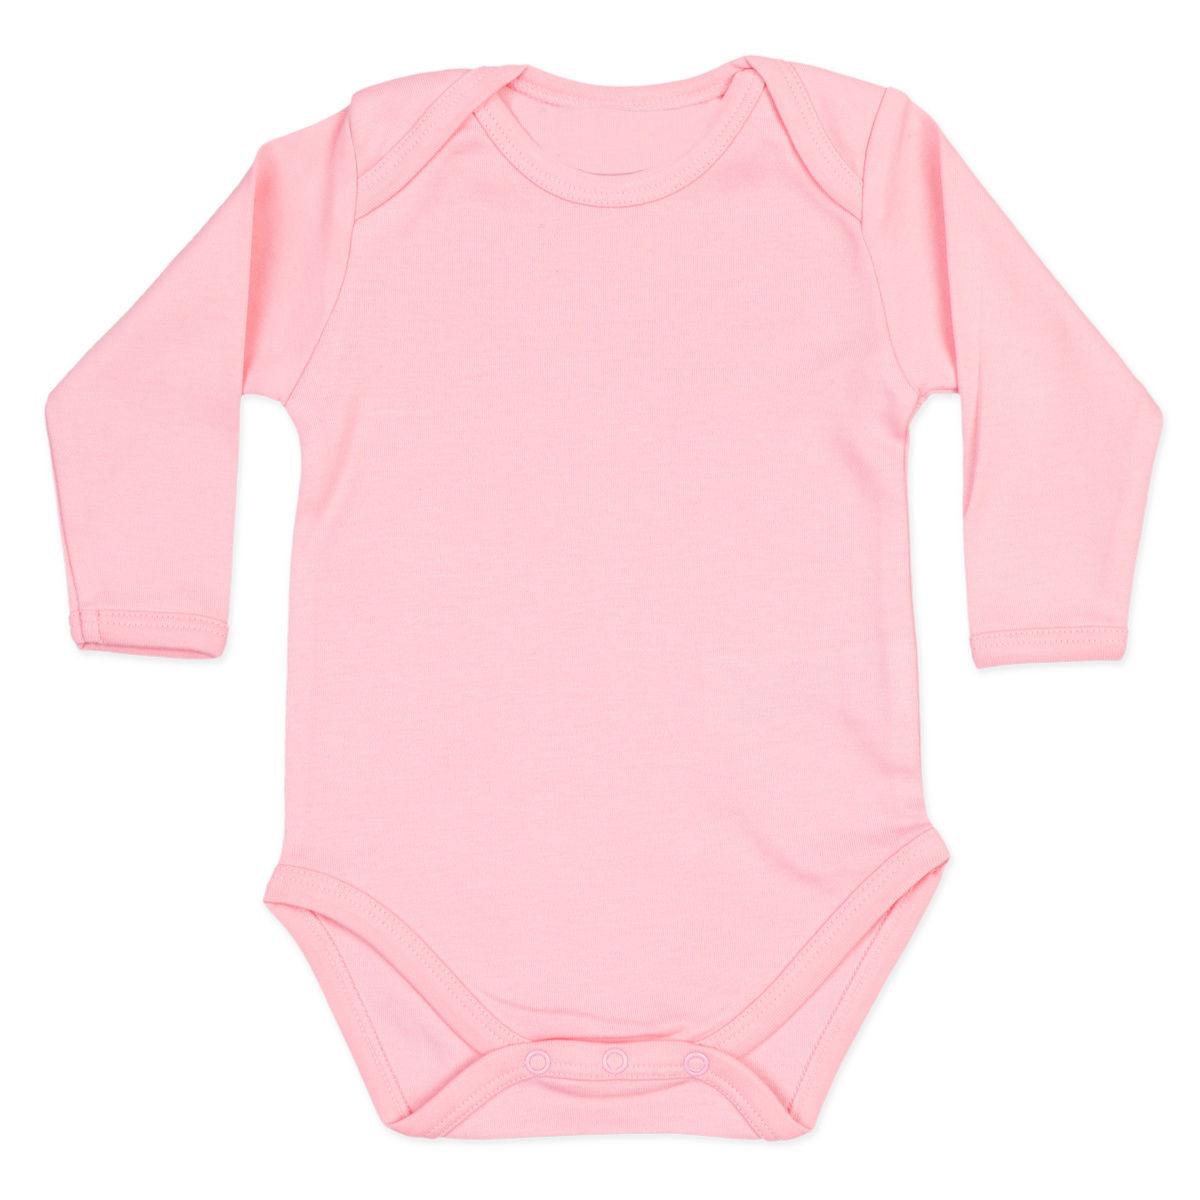 Body para Bebe Ribana Rosa Manga Longa - Valor Unitário